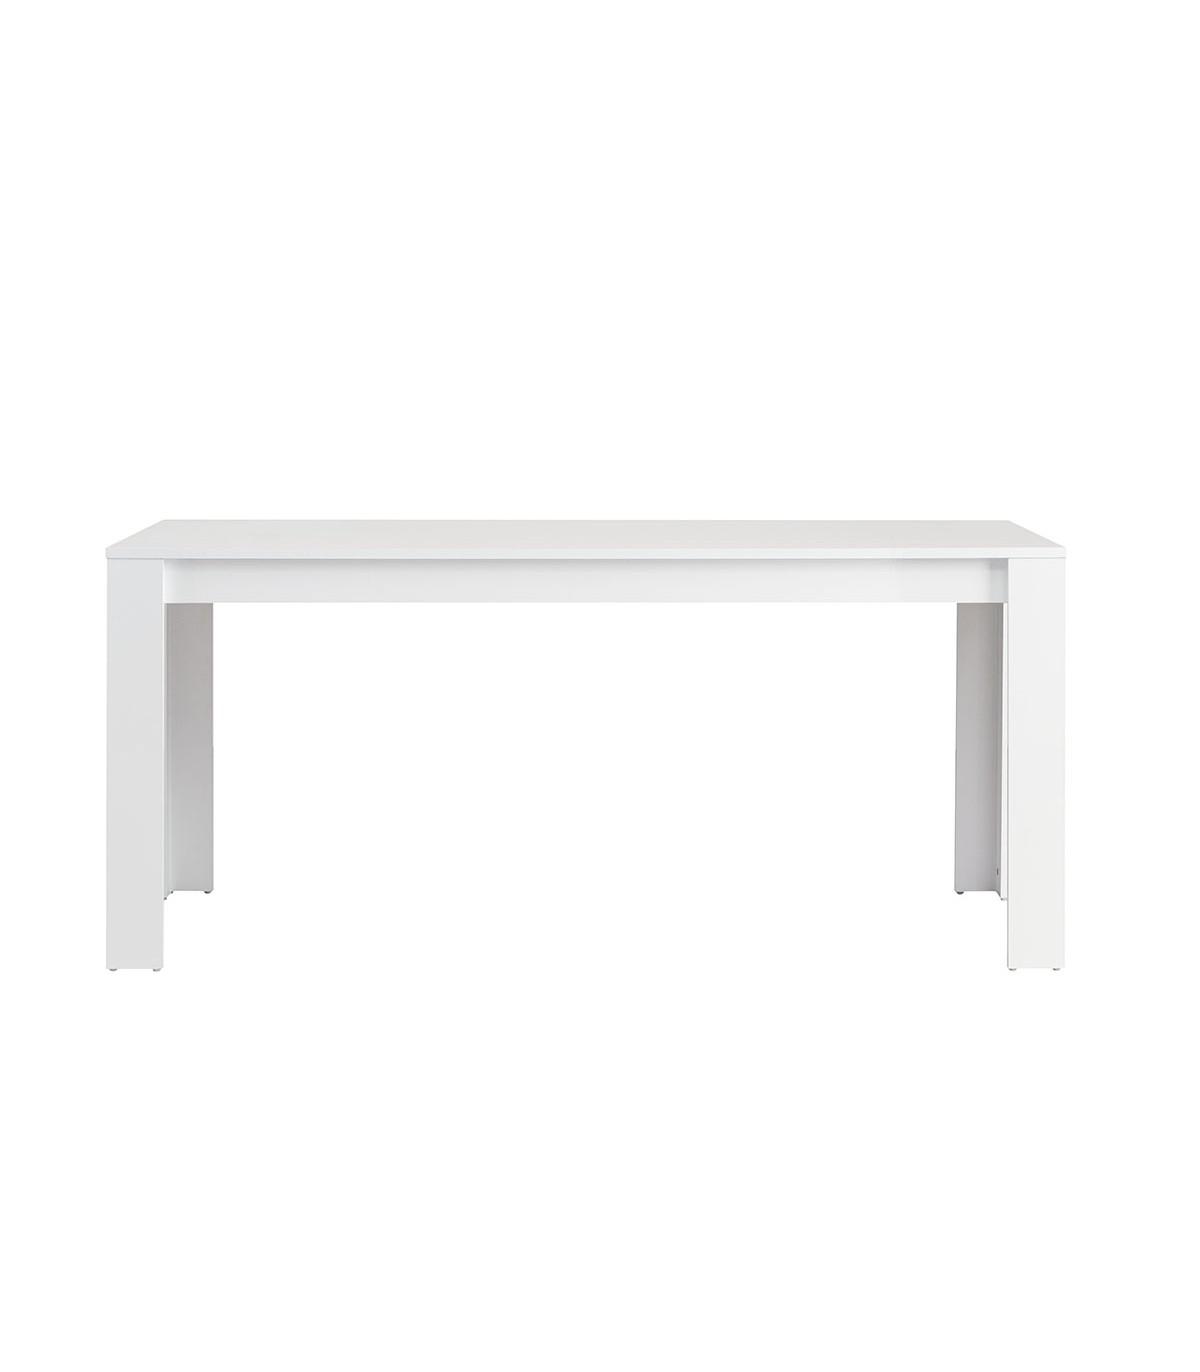 Table à manger 170 cm - 6 pers. - Blanc